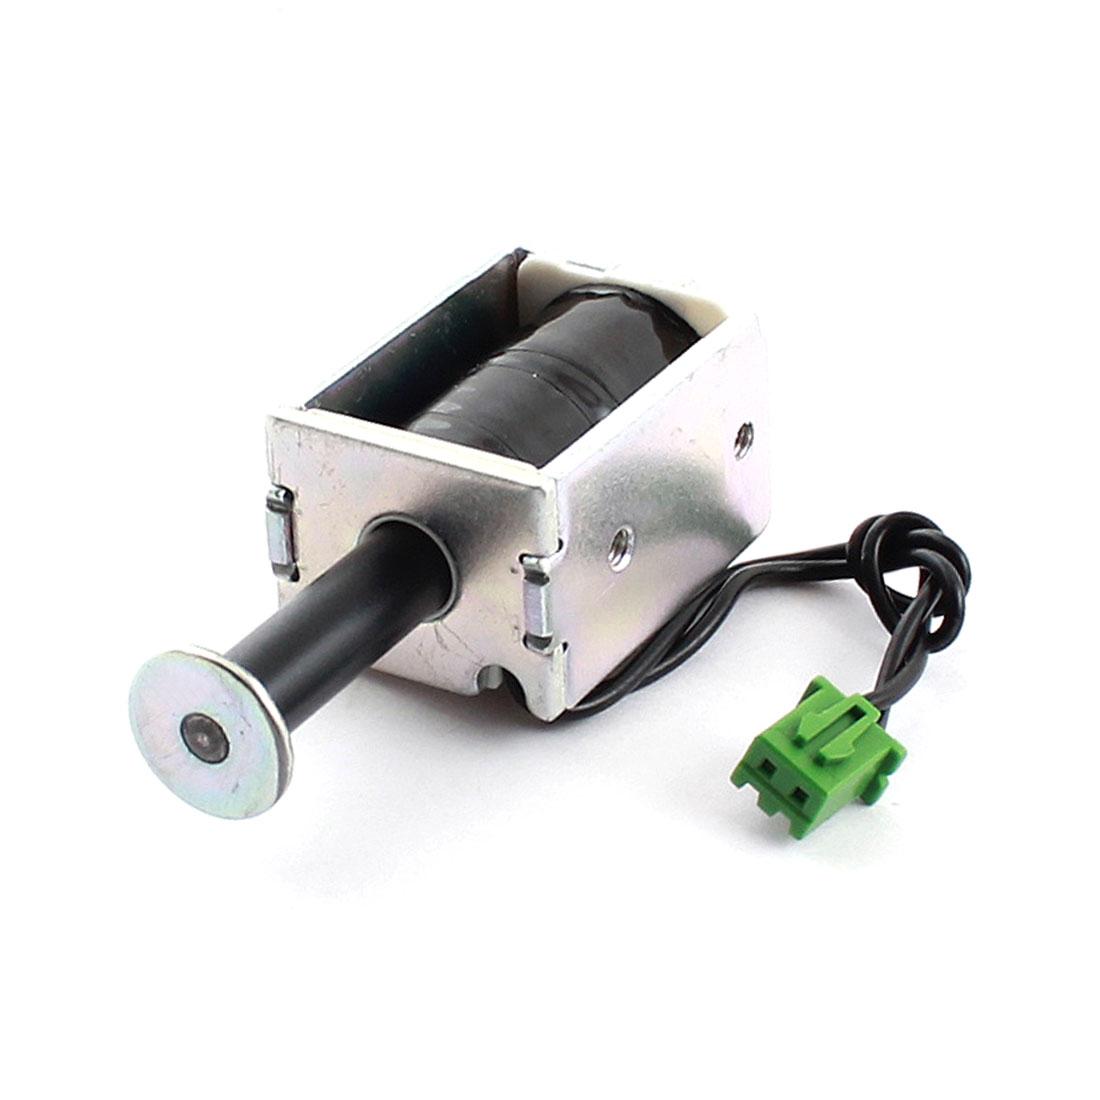 DC 15V 0.68A 220g/3mm Push Pull Actuator Magnet Solenoid Electromagnet